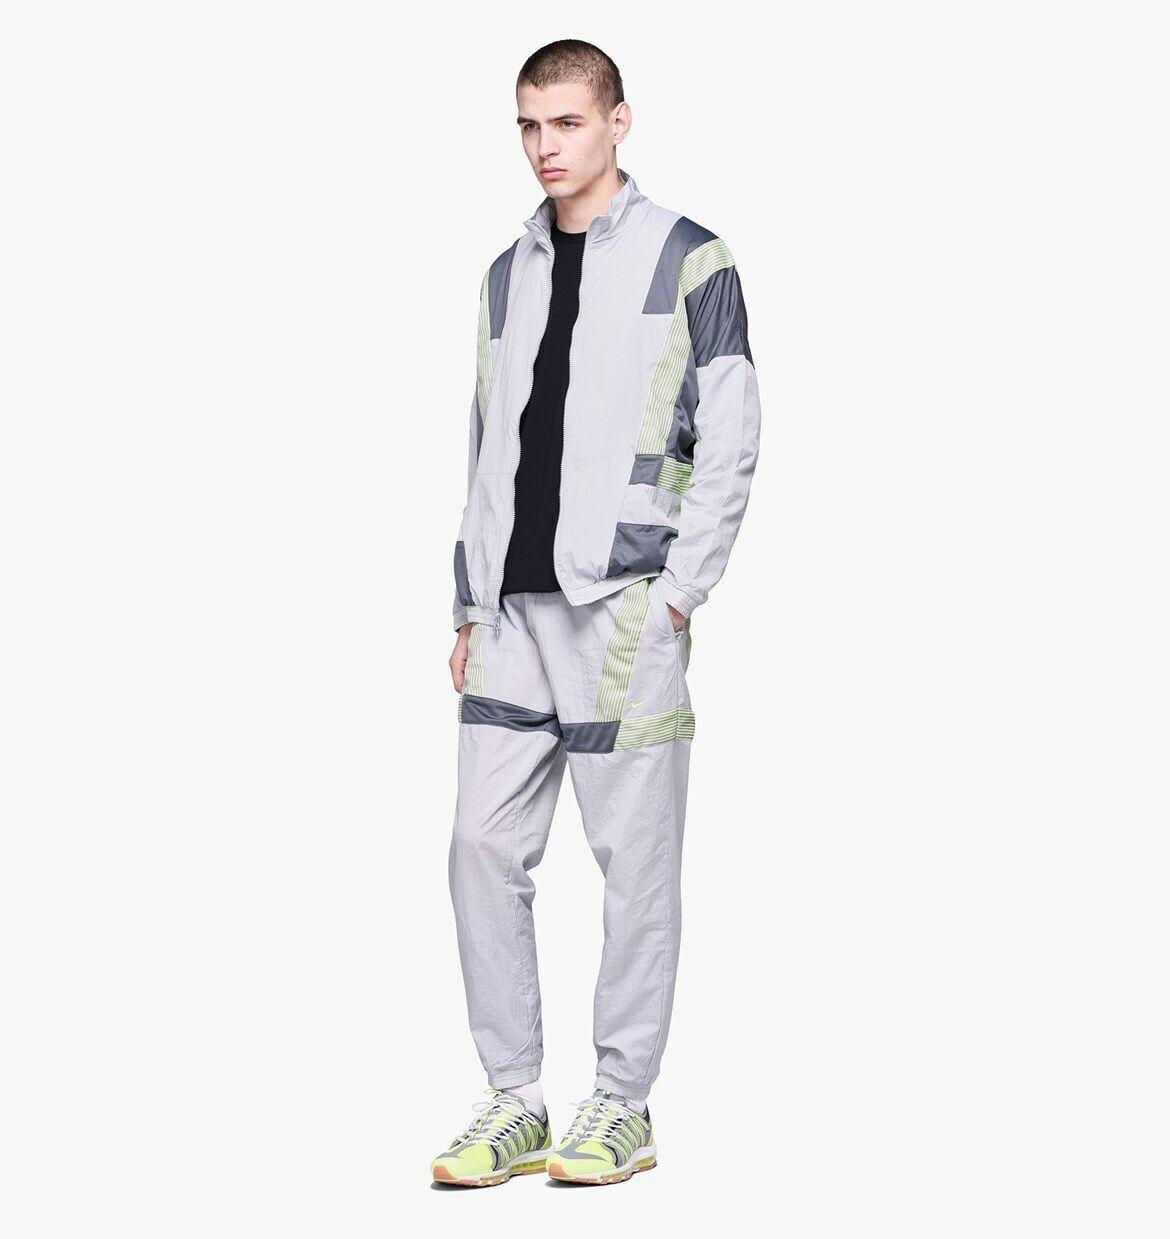 NWT $200 MEN'S NIKE X CLOT TRACKSUIT WOLF GREY DARK VOLT REF